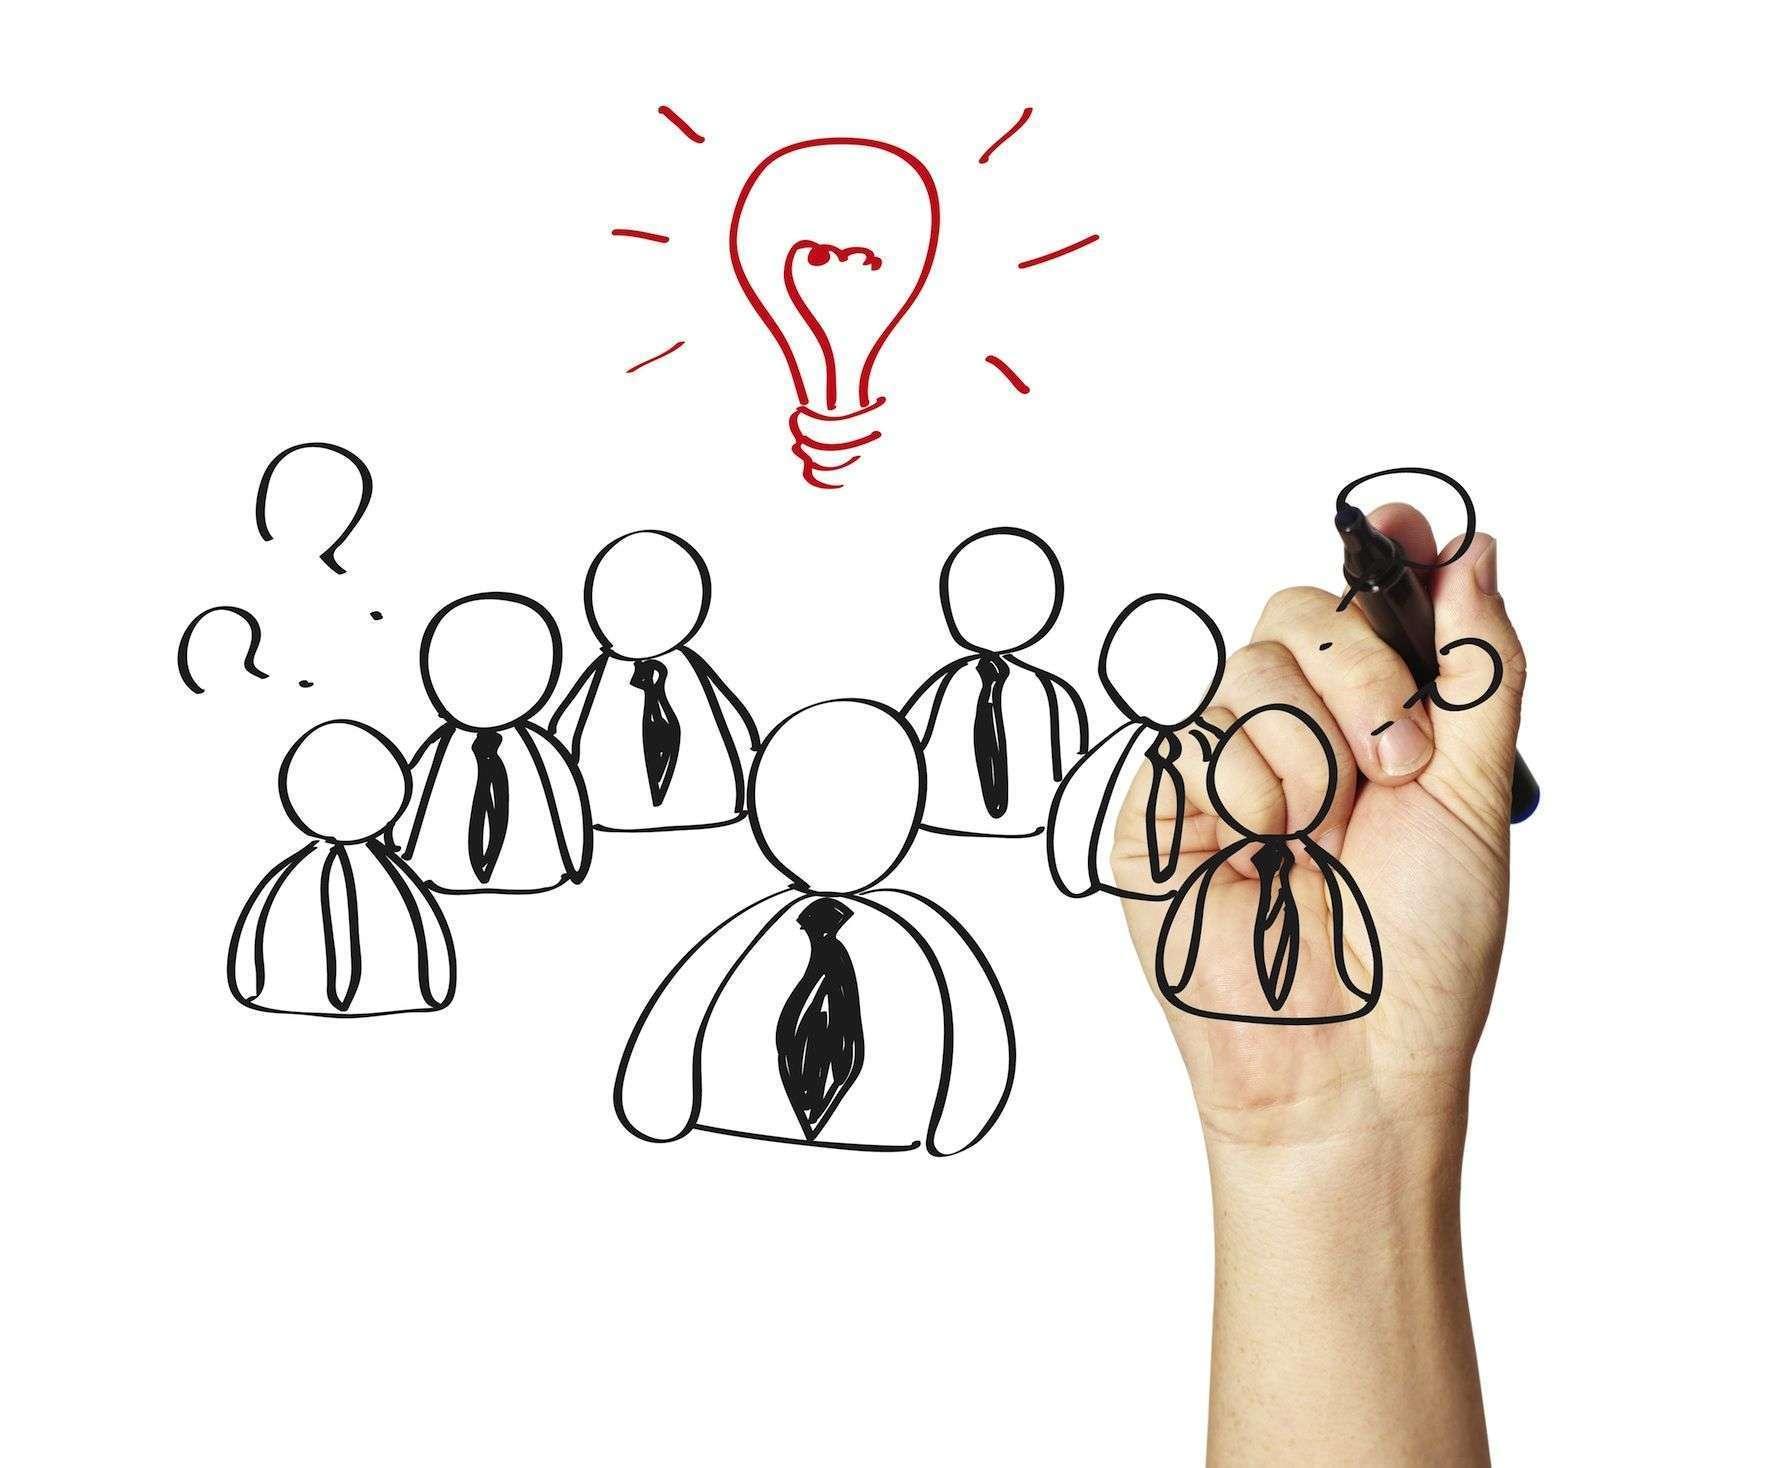 design_thinking1